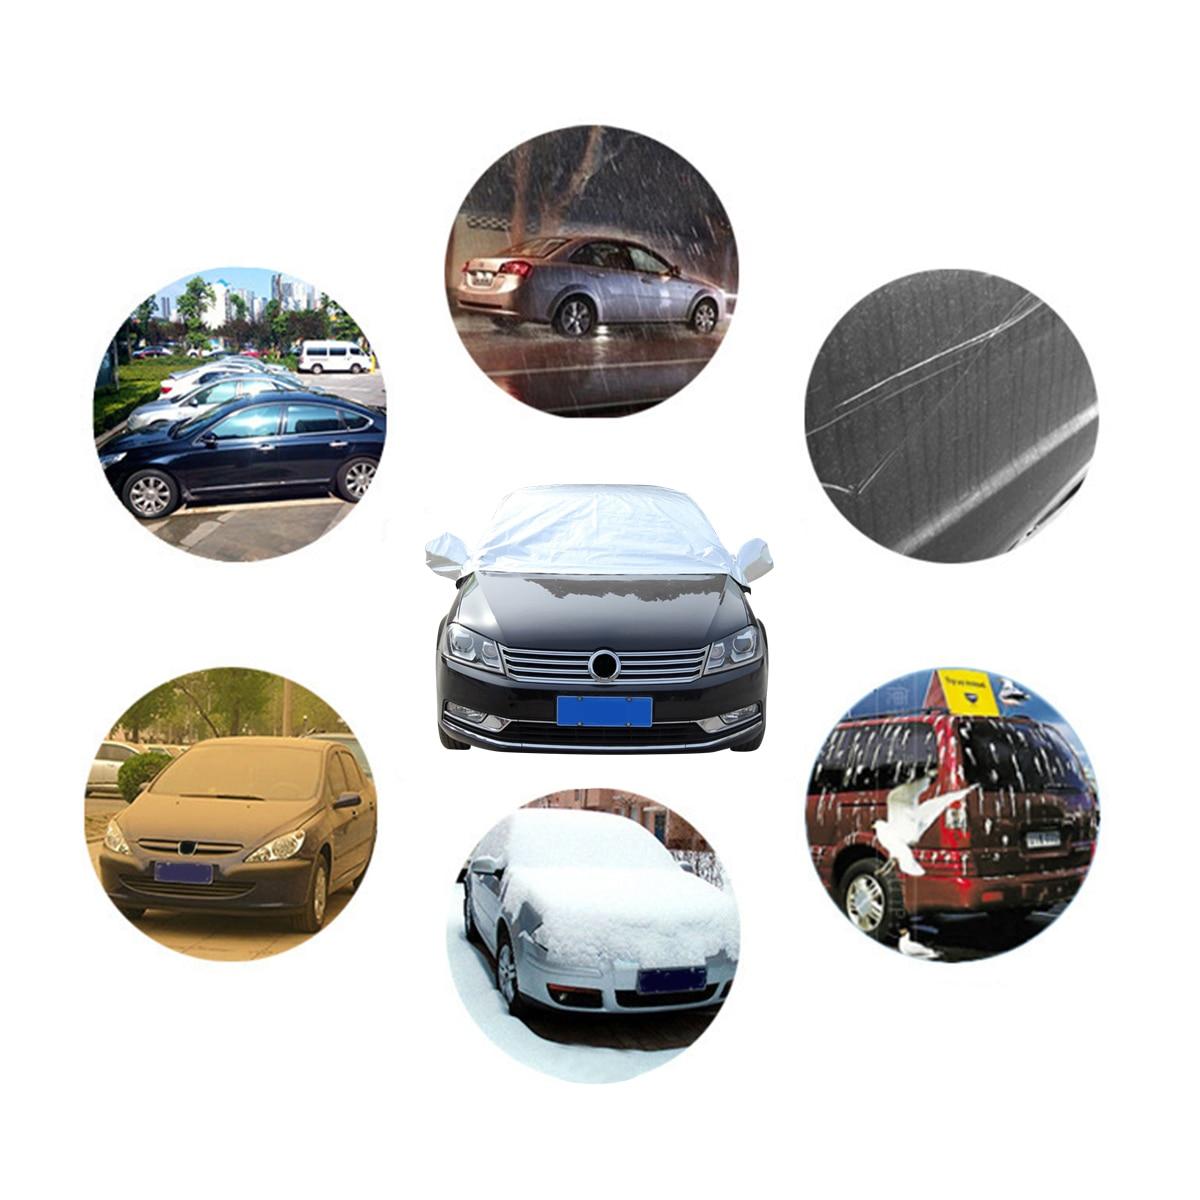 lowest price SUNICE 21X30CM Car Photochromic Film Color Changed Car Window Tint VLT 75percent 20percent Nano Tint Summer Solar UV Protector A4 sample